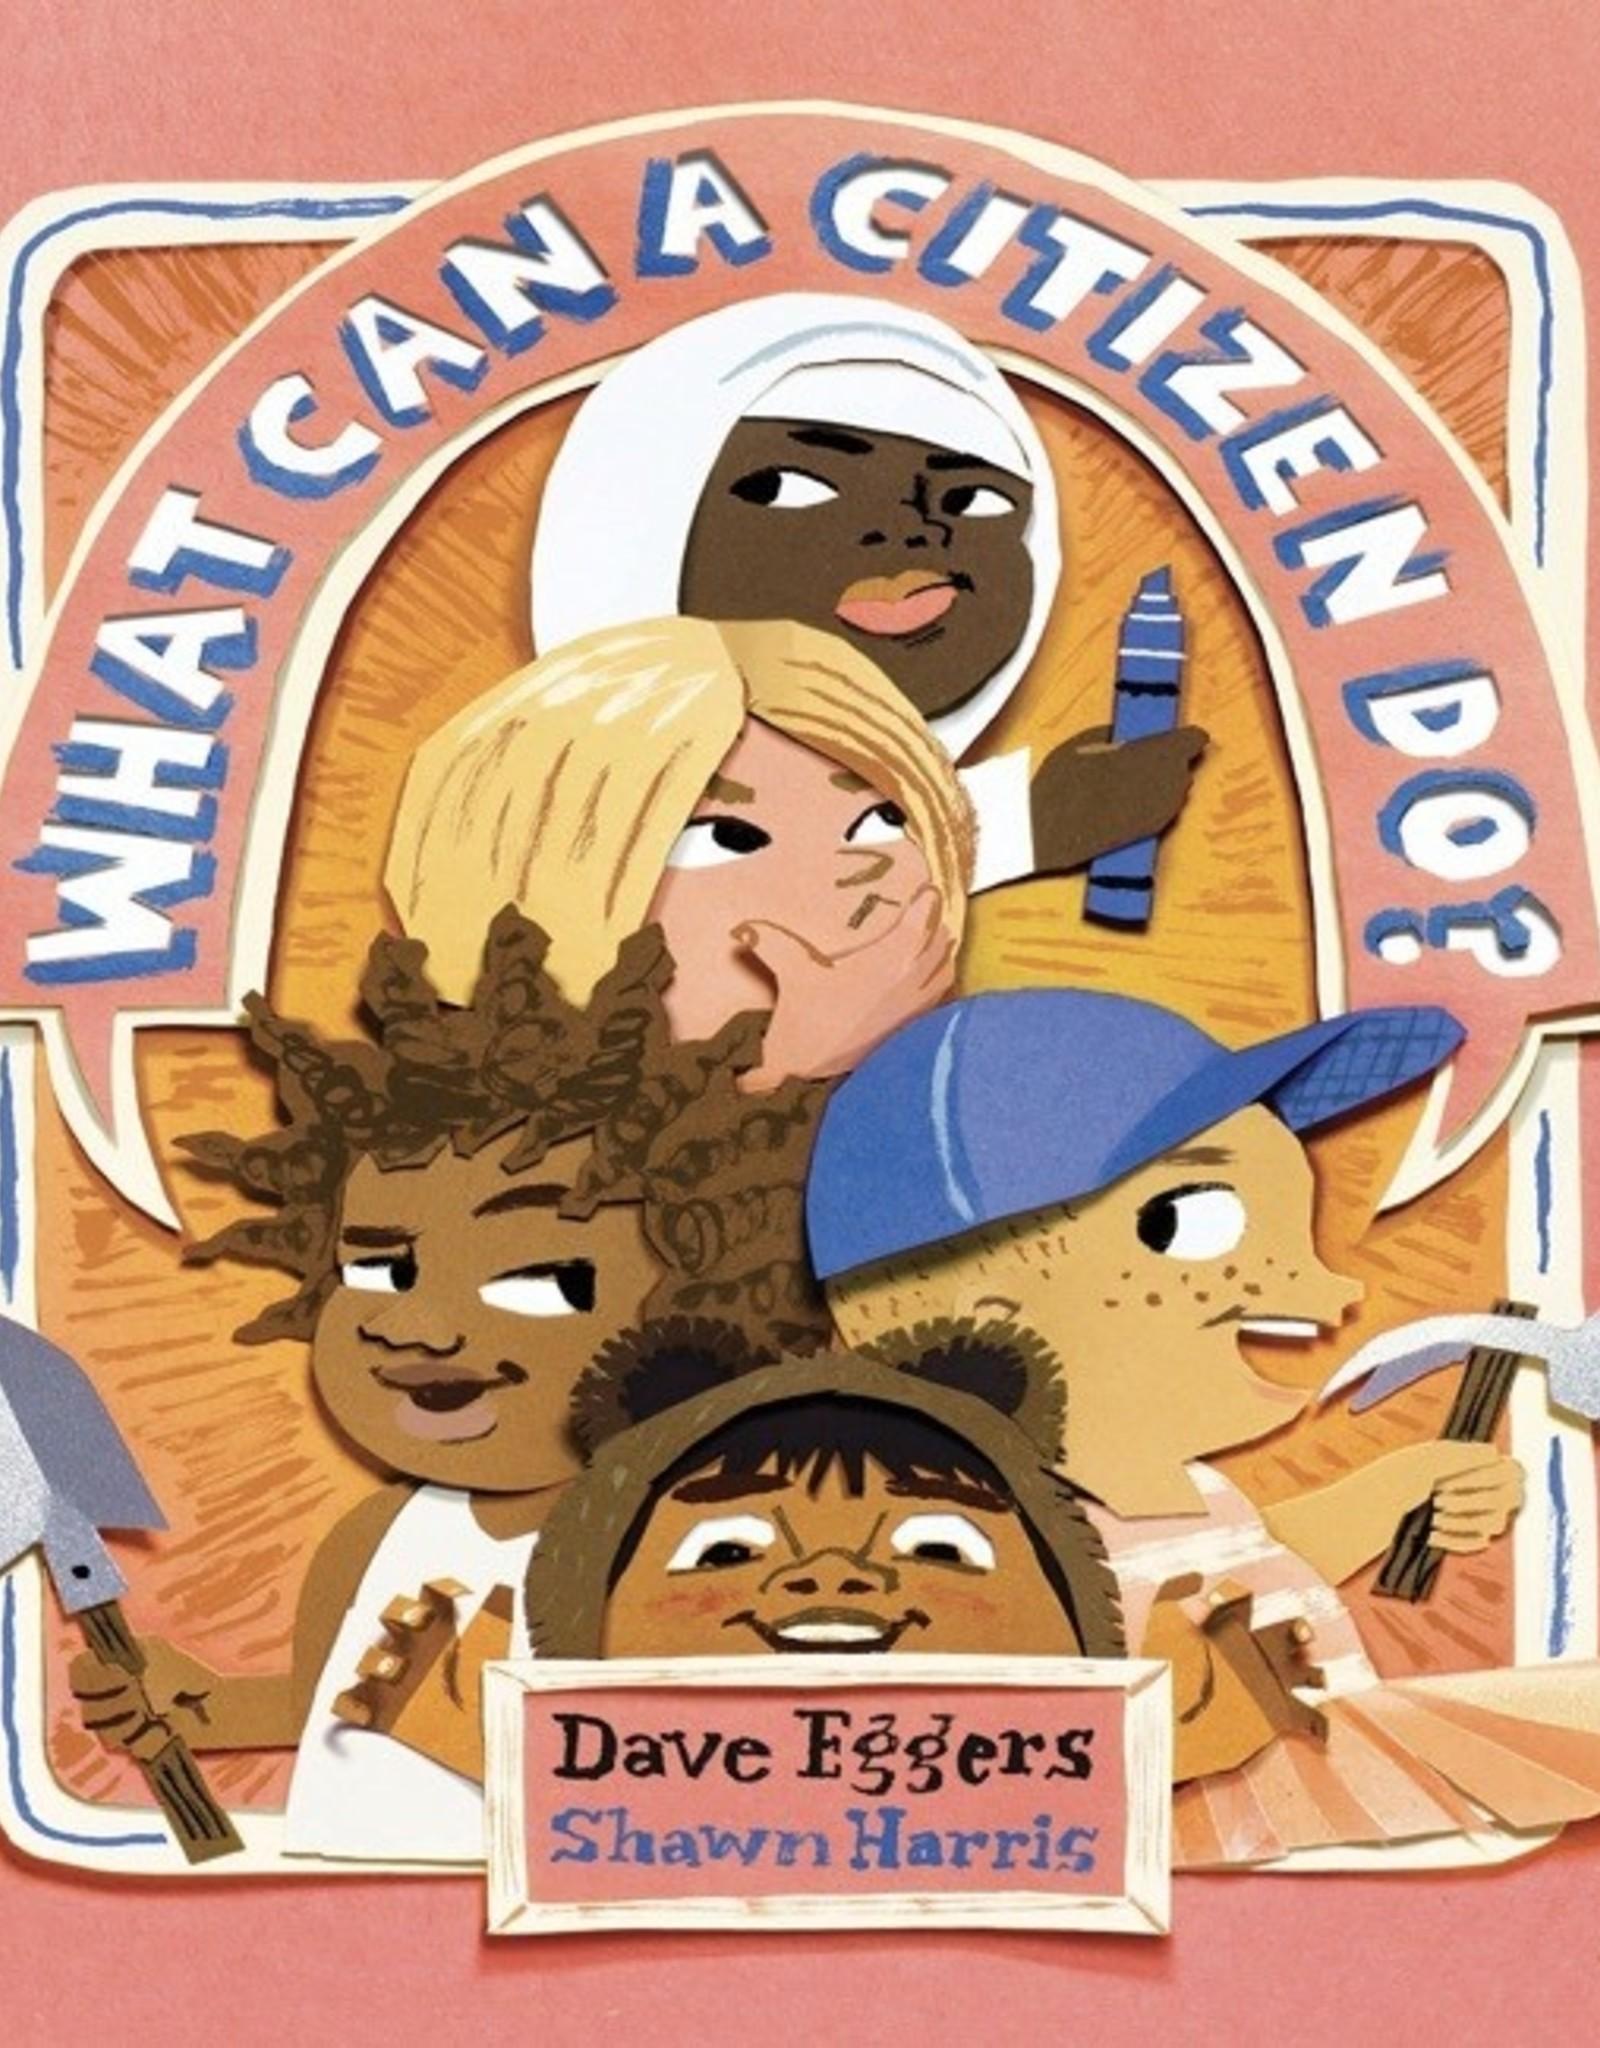 Book - What Can A Citizen Do?